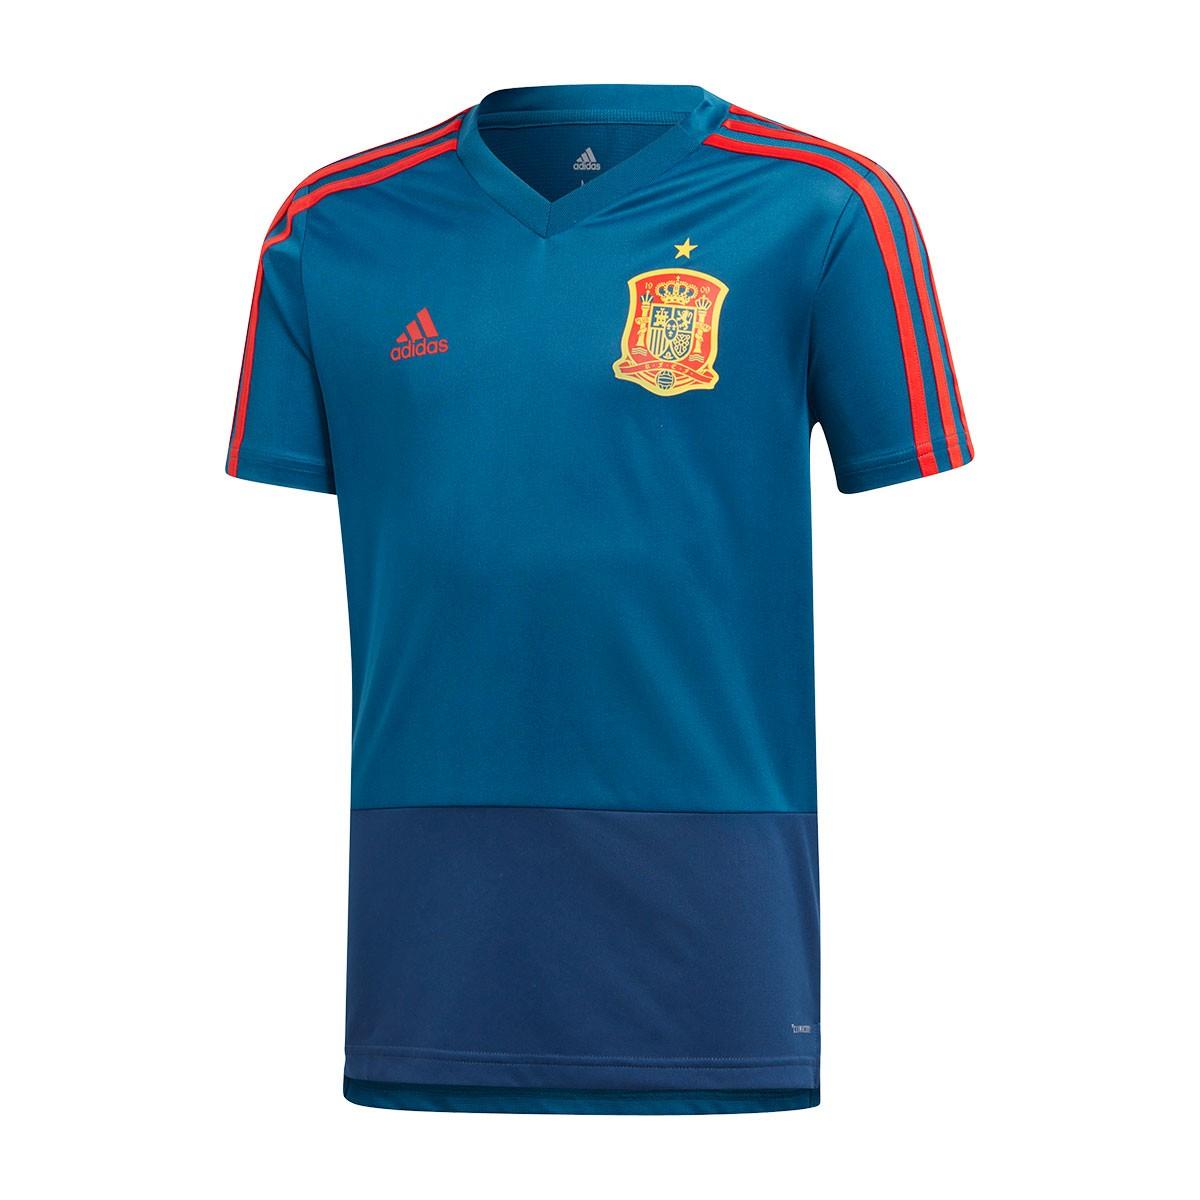 2fb66f39e583b Camiseta adidas Training España 2017-2018 Niño Tribe blue-Red - Tienda de fútbol  Fútbol Emotion